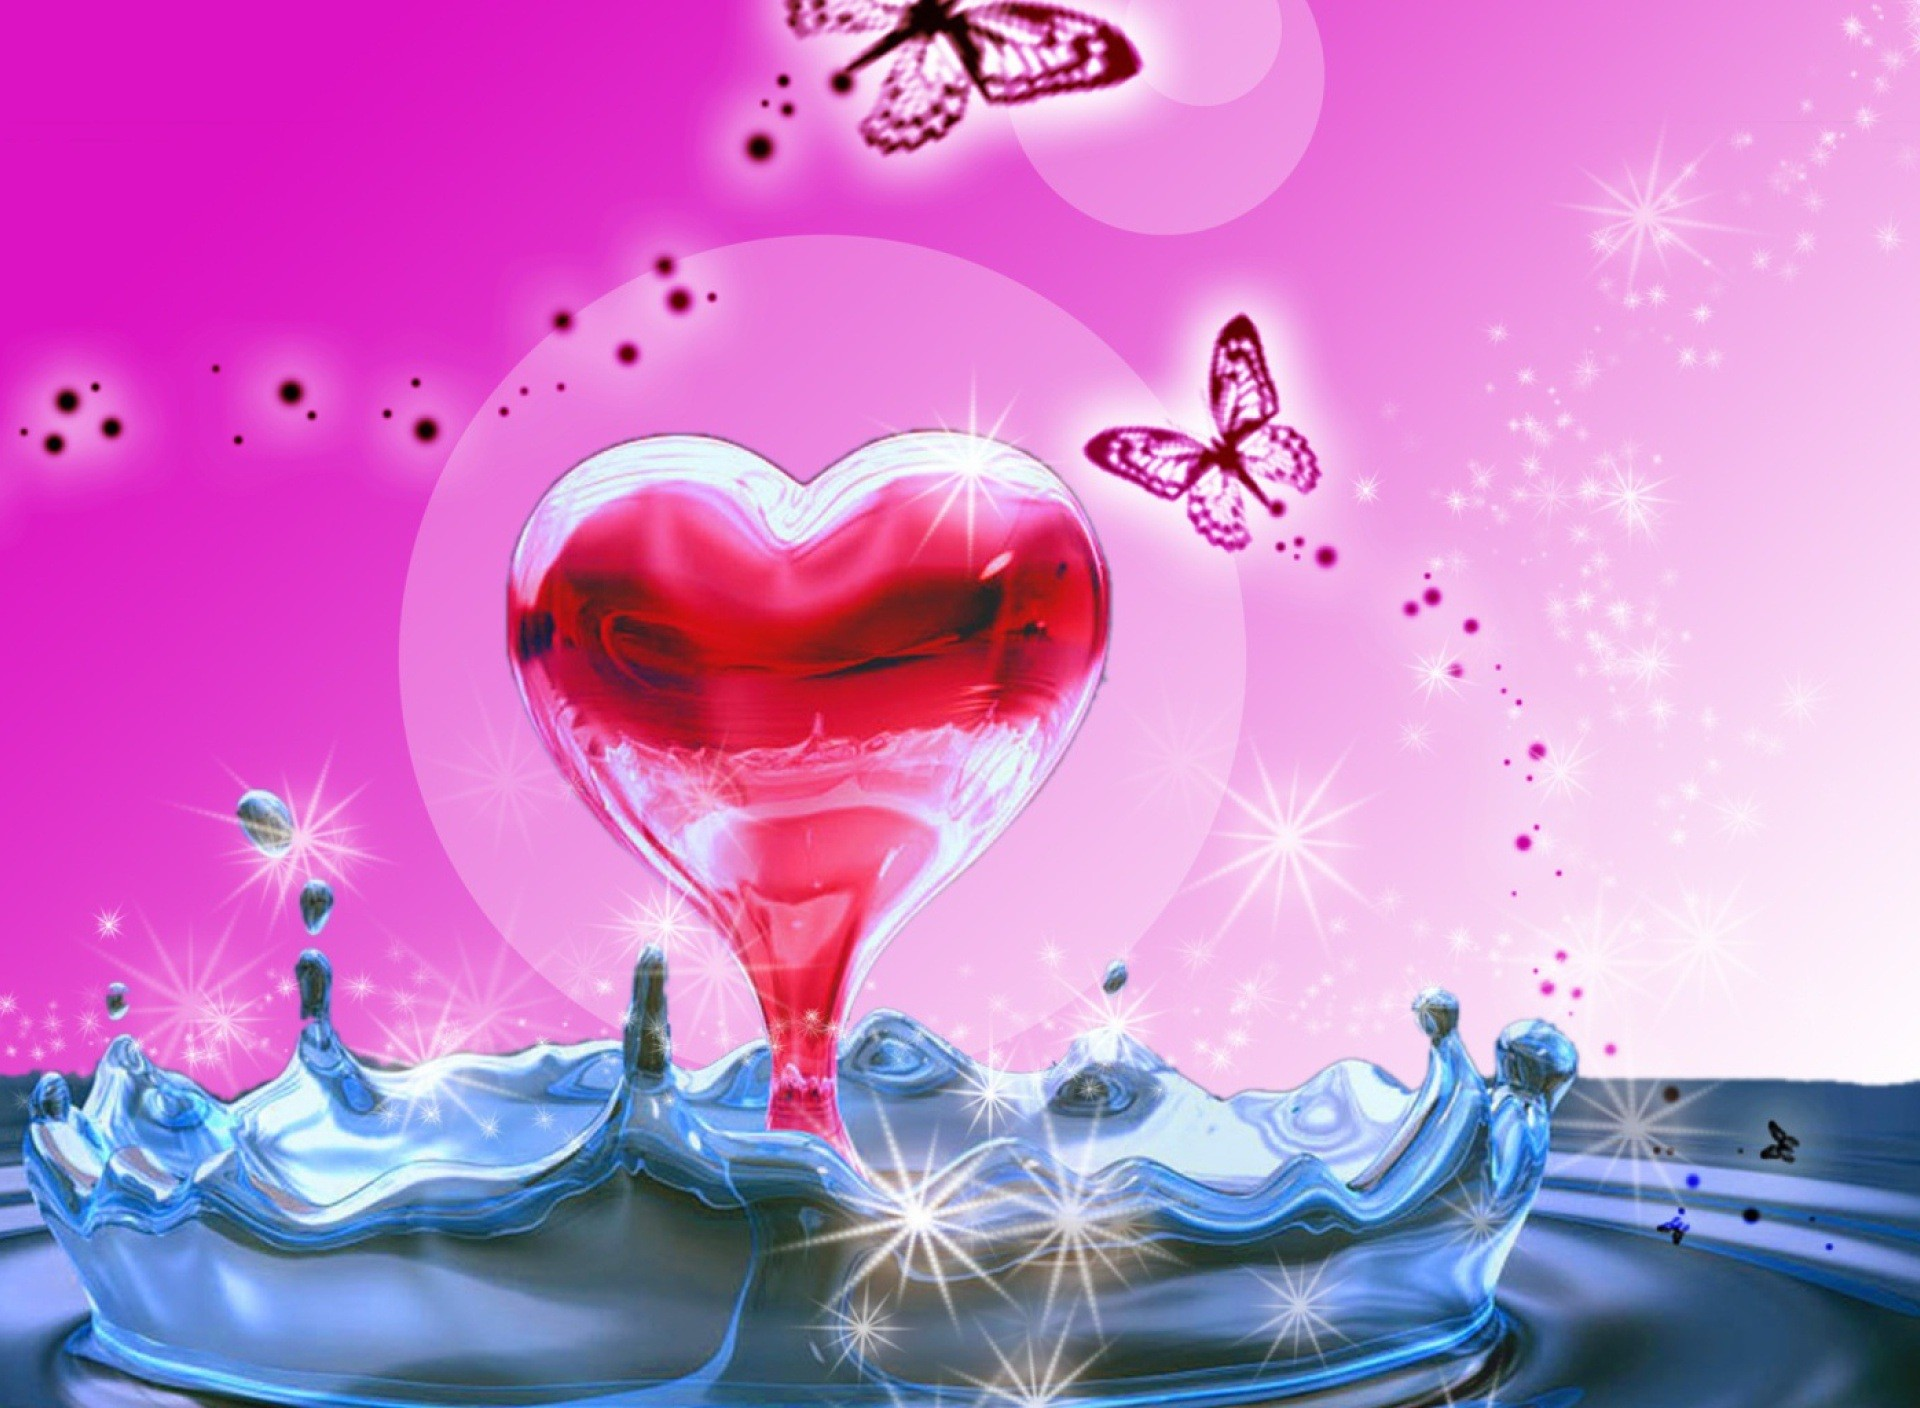 3D Heart In Water wallpaperwallpaper screensaver .